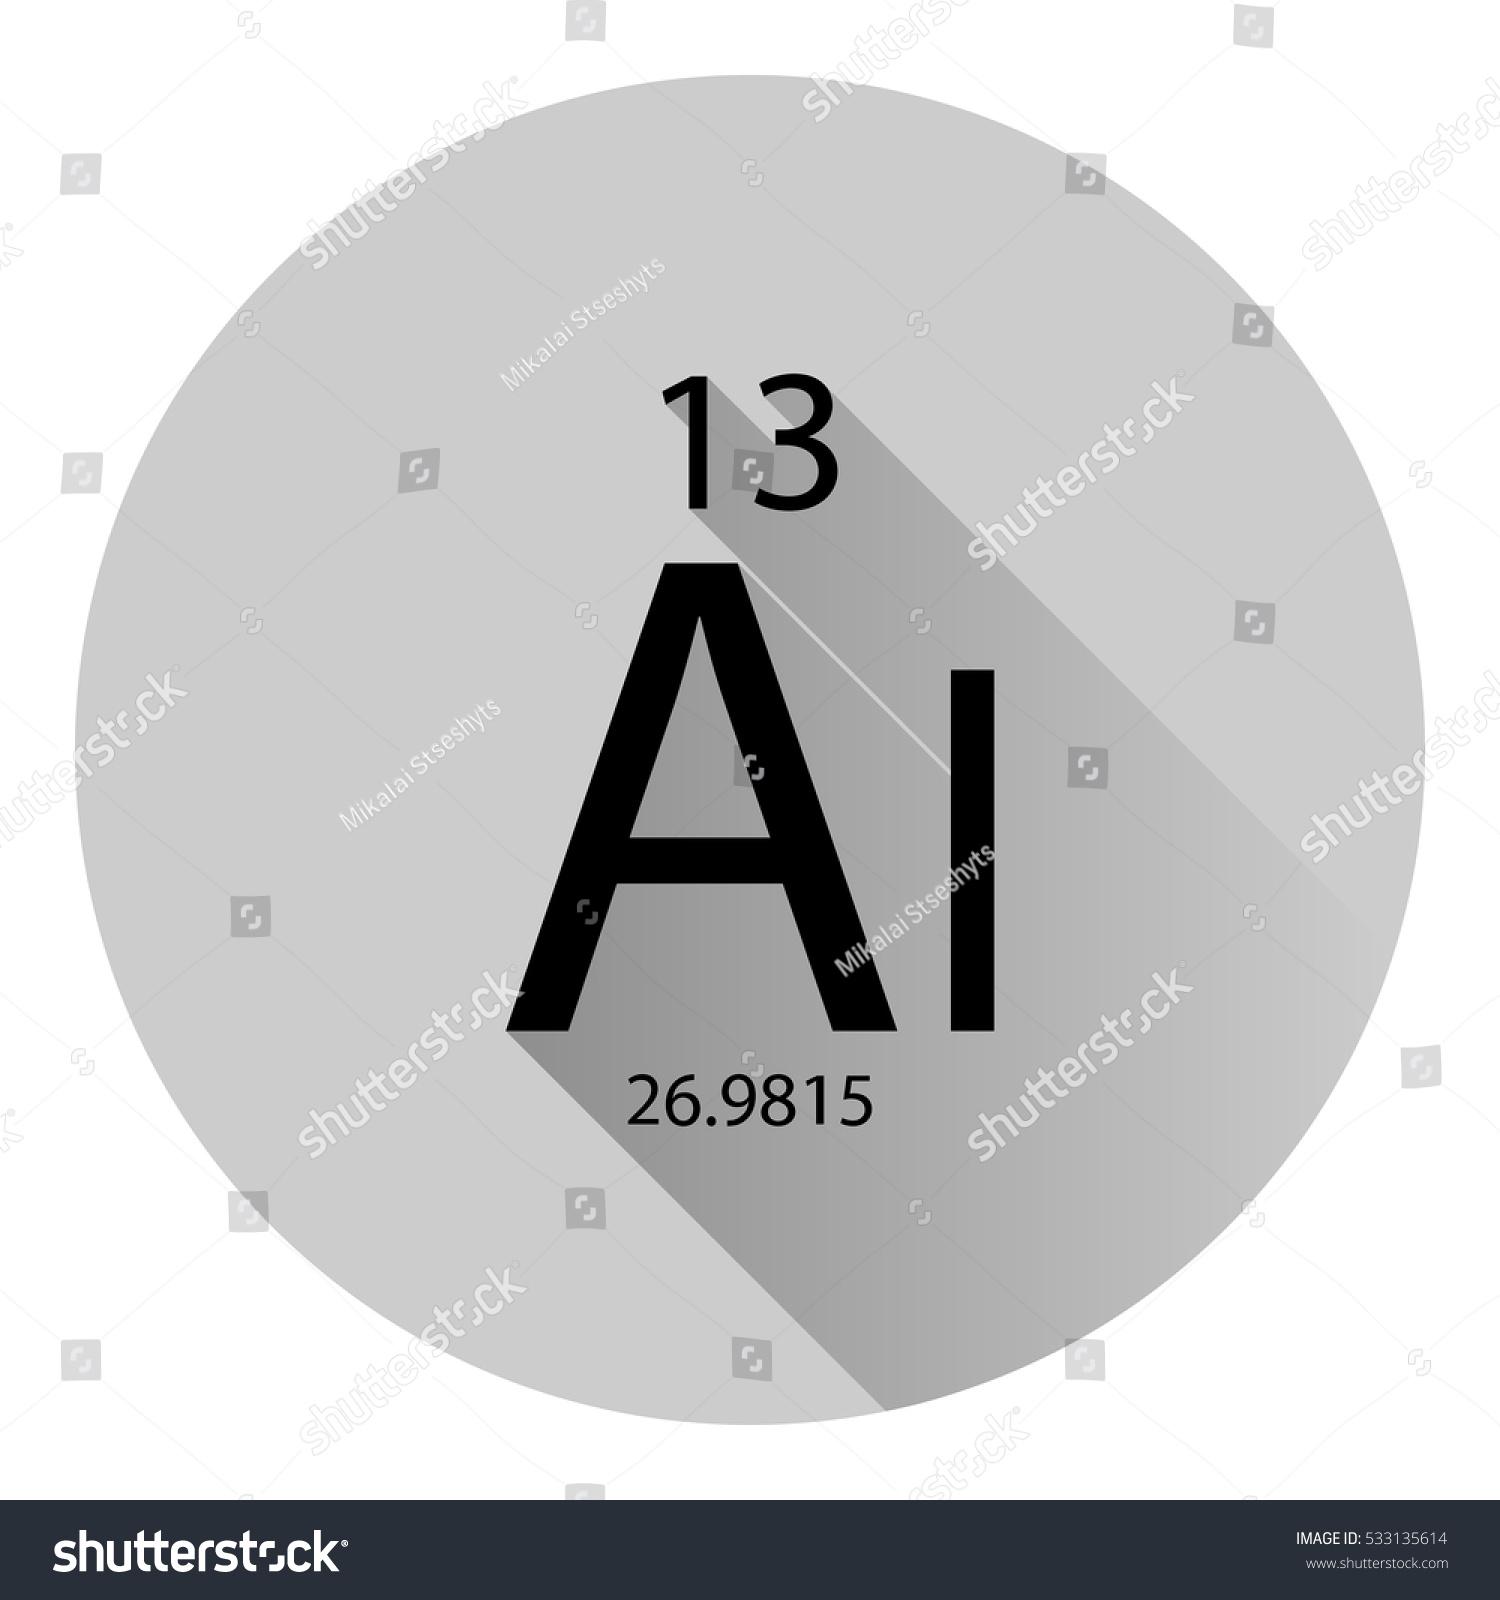 Periodic table element aluminium basic properties stock vector the periodic table element aluminium with the basic properties flat style with long shadow gamestrikefo Gallery